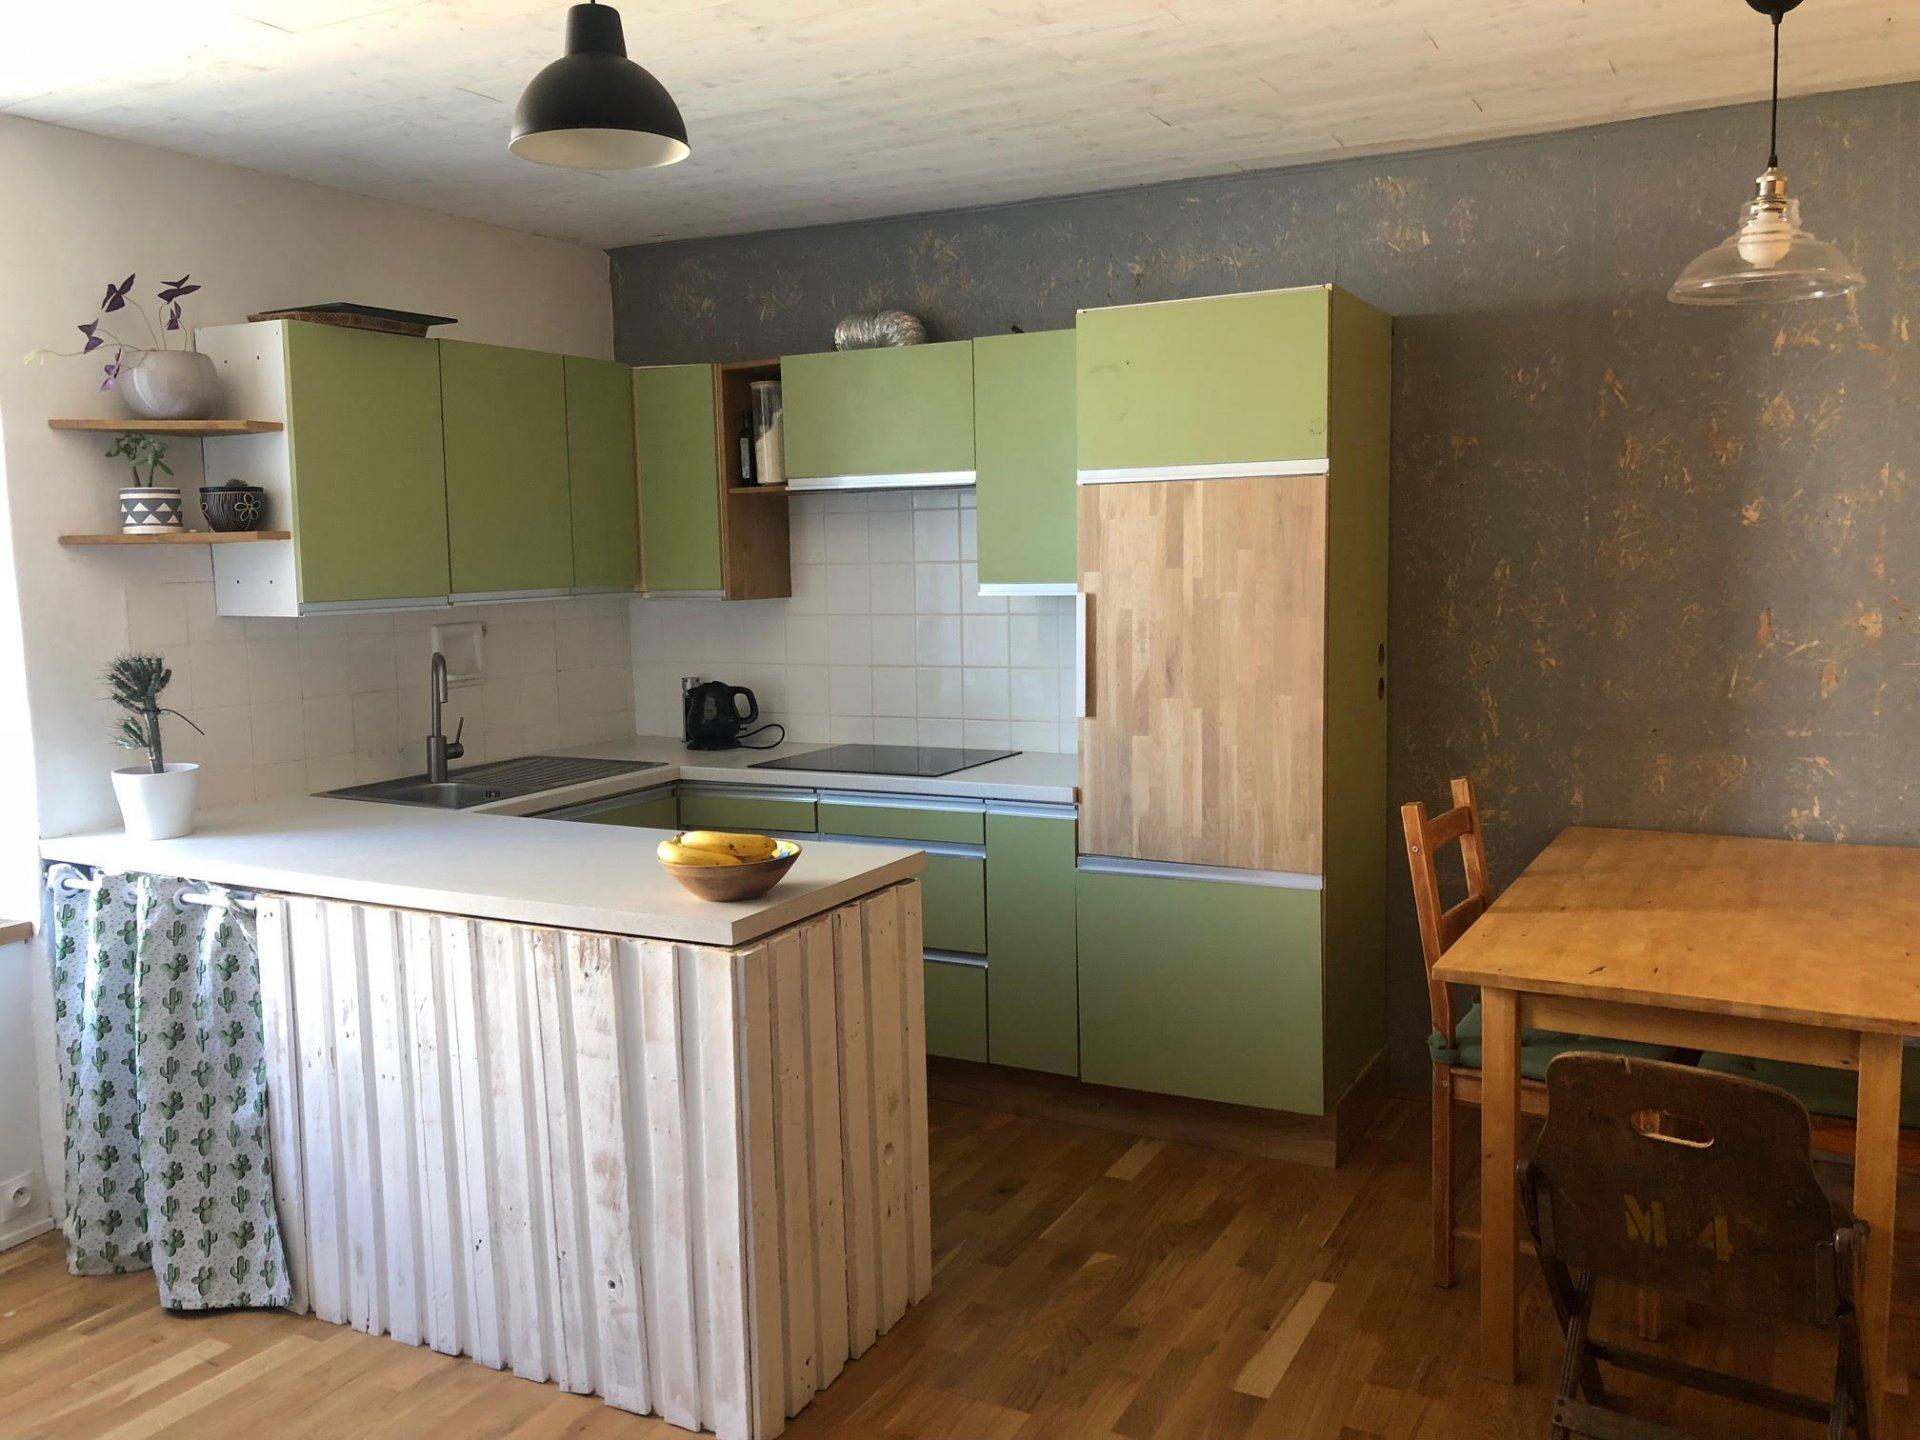 Location Appartement - Nantes Chantenay - Sainte-Anne